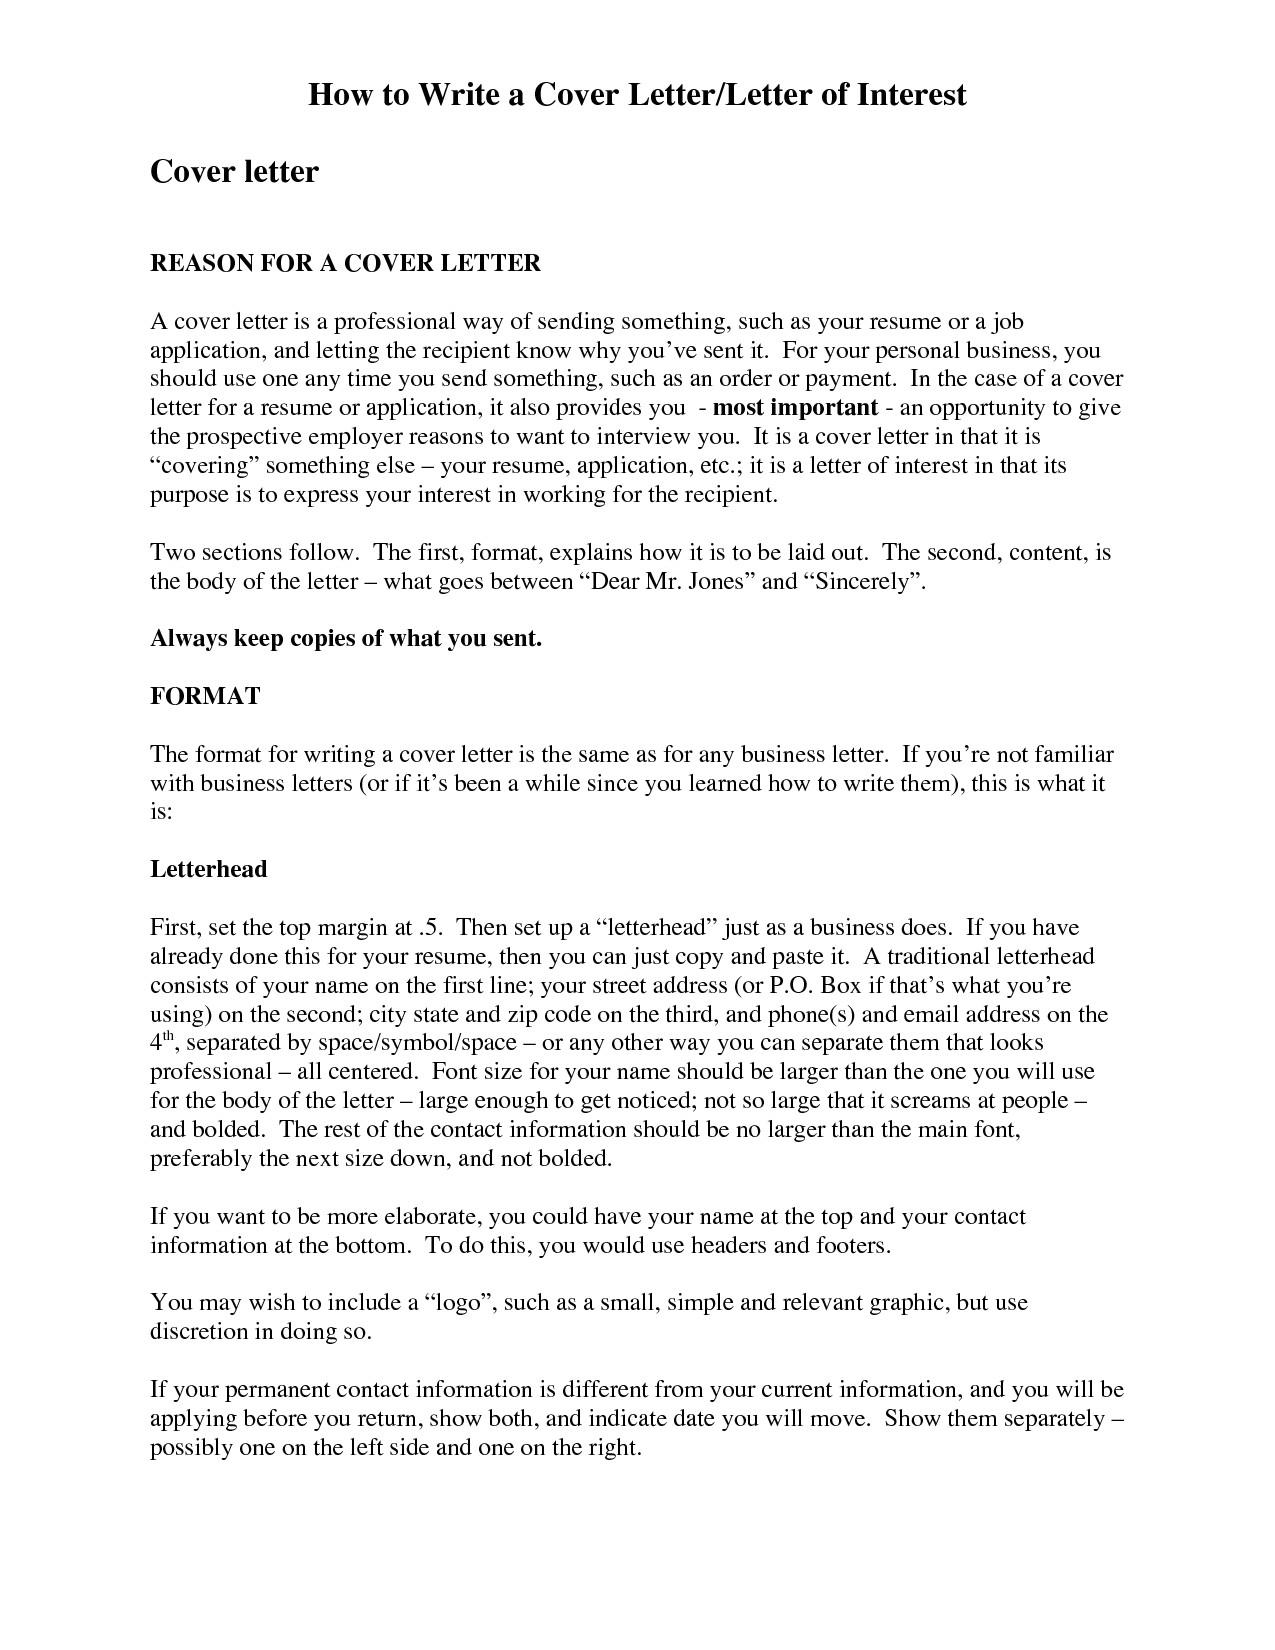 Letter Of Interest or Cover Letter Letter Of Interest Cover Letter the Letter Sample